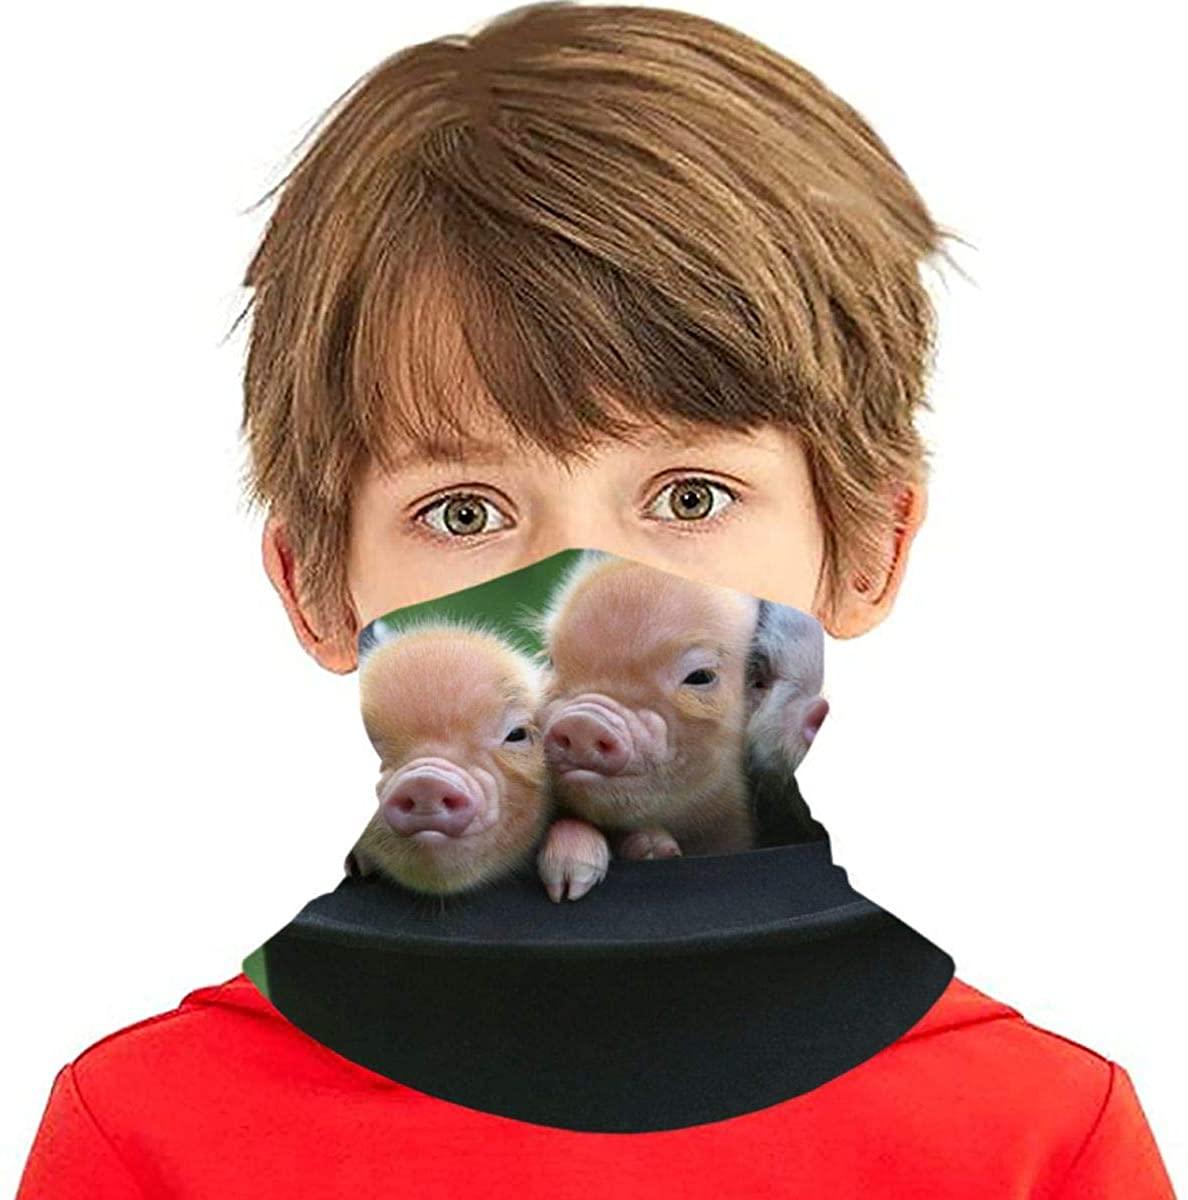 Youth Face Bandanas, Teacup Pigs Reusable Face Mask Half Face Towel Mouth Cloth Facial Scarf Variety Headscarf